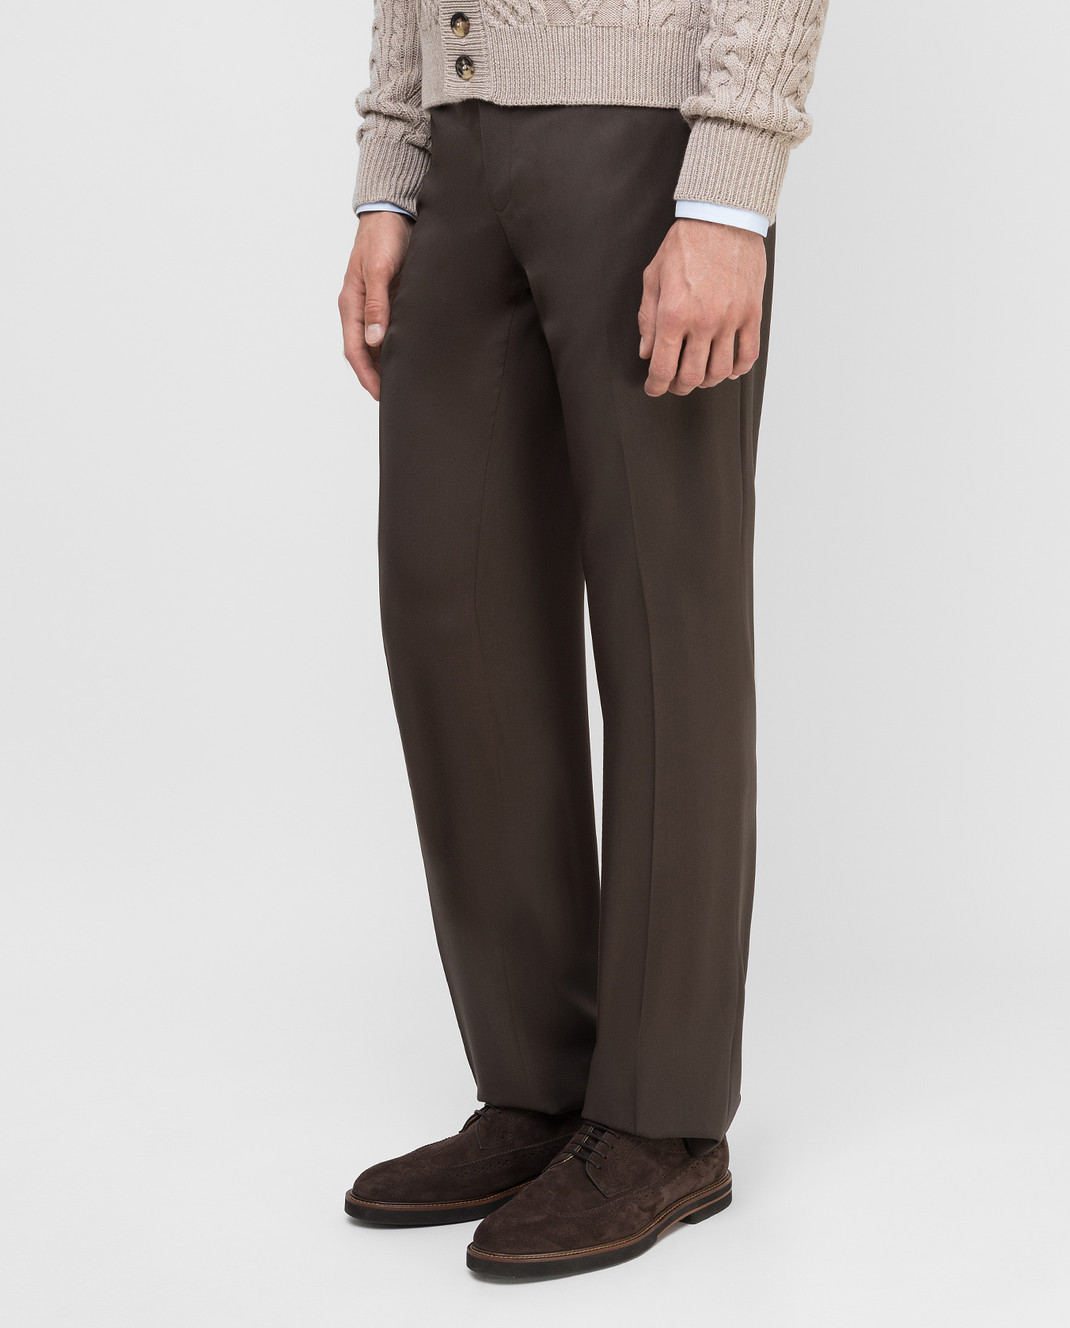 Castello d'Oro Темно-коричневые брюки из шерсти изображение 3